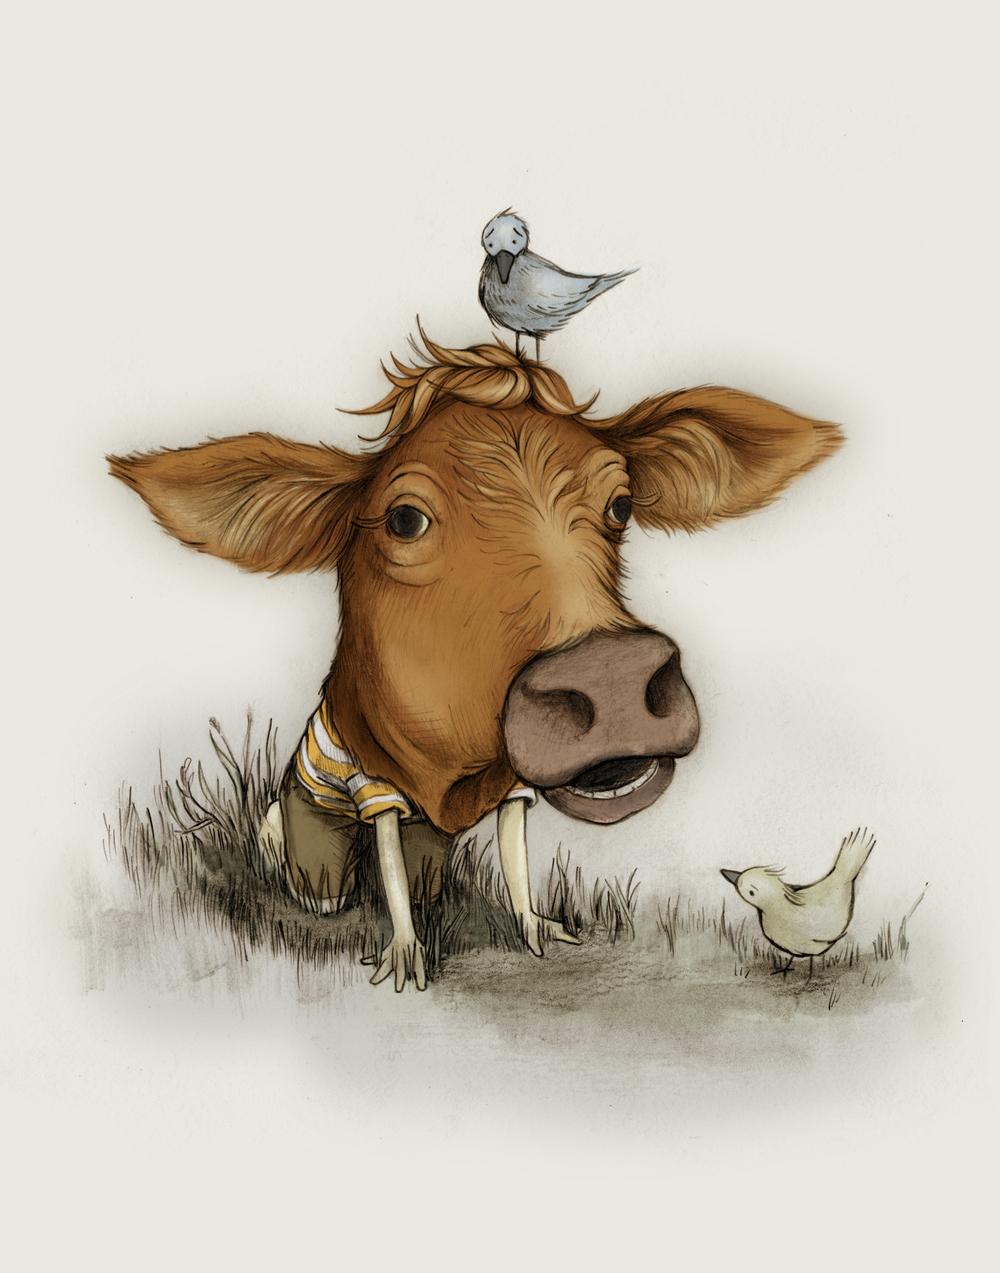 Cow_01.jpg